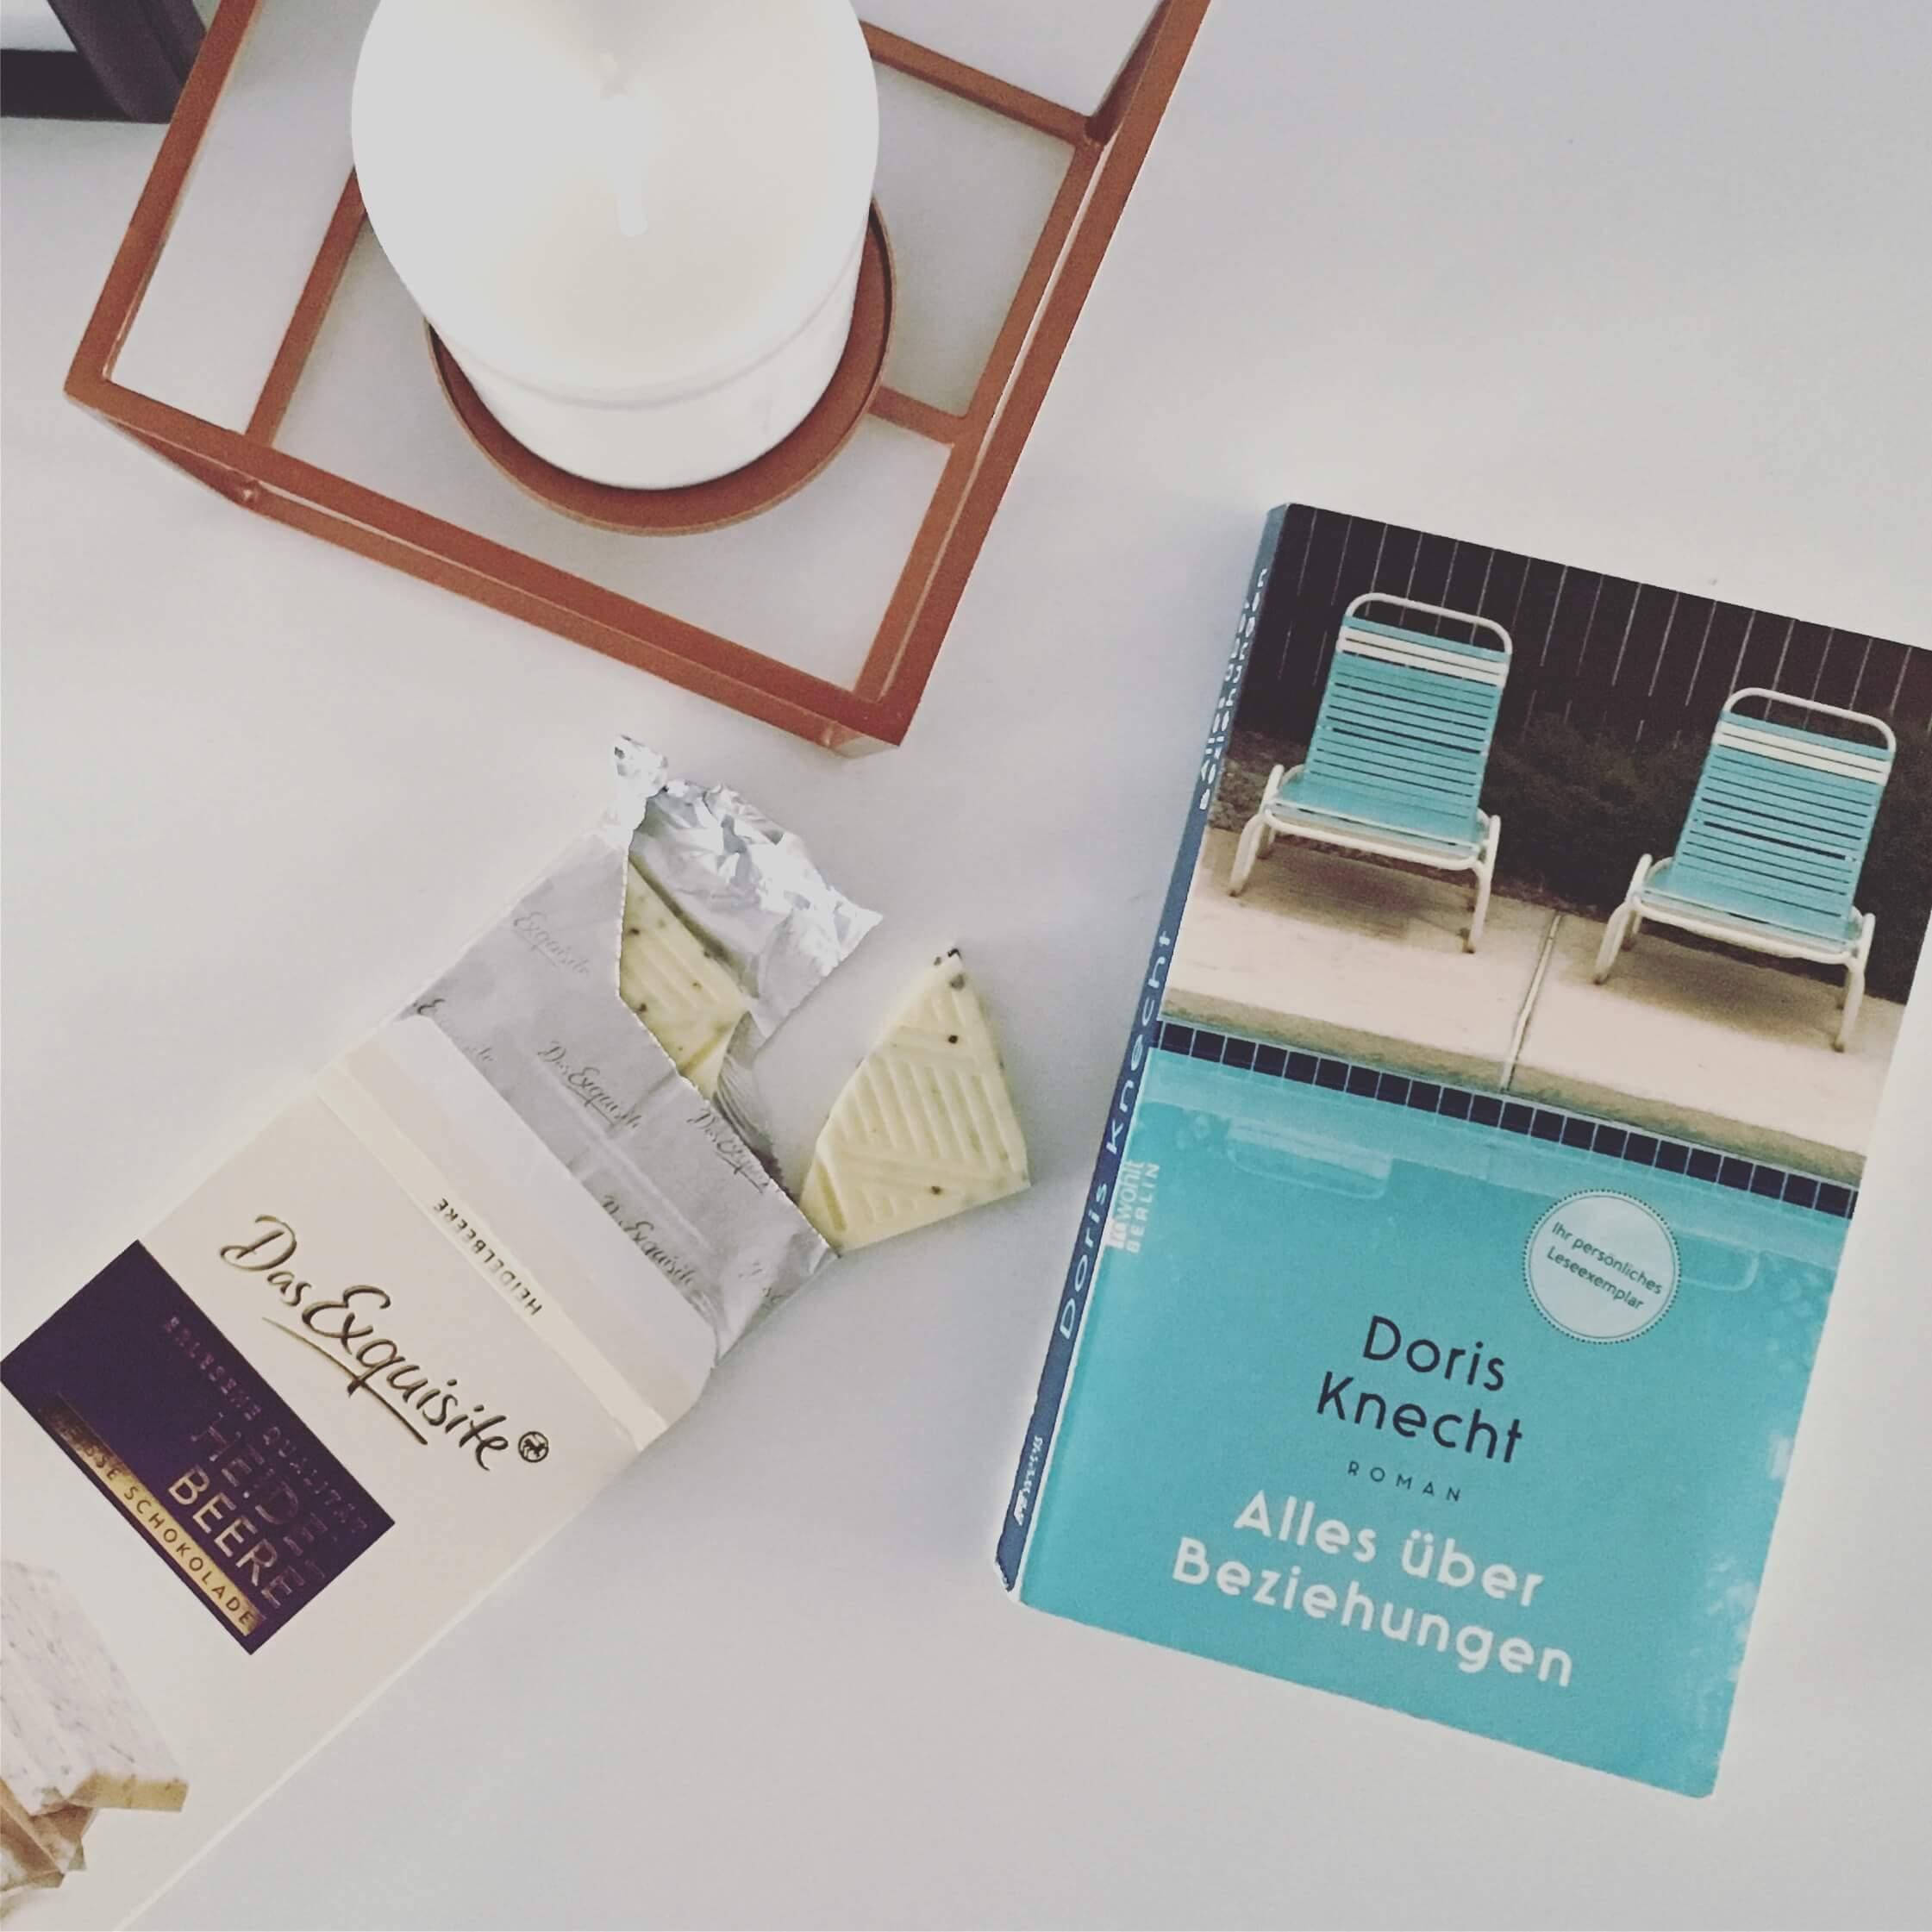 Besprechung zu dem neuen Roman von Doris Knecht